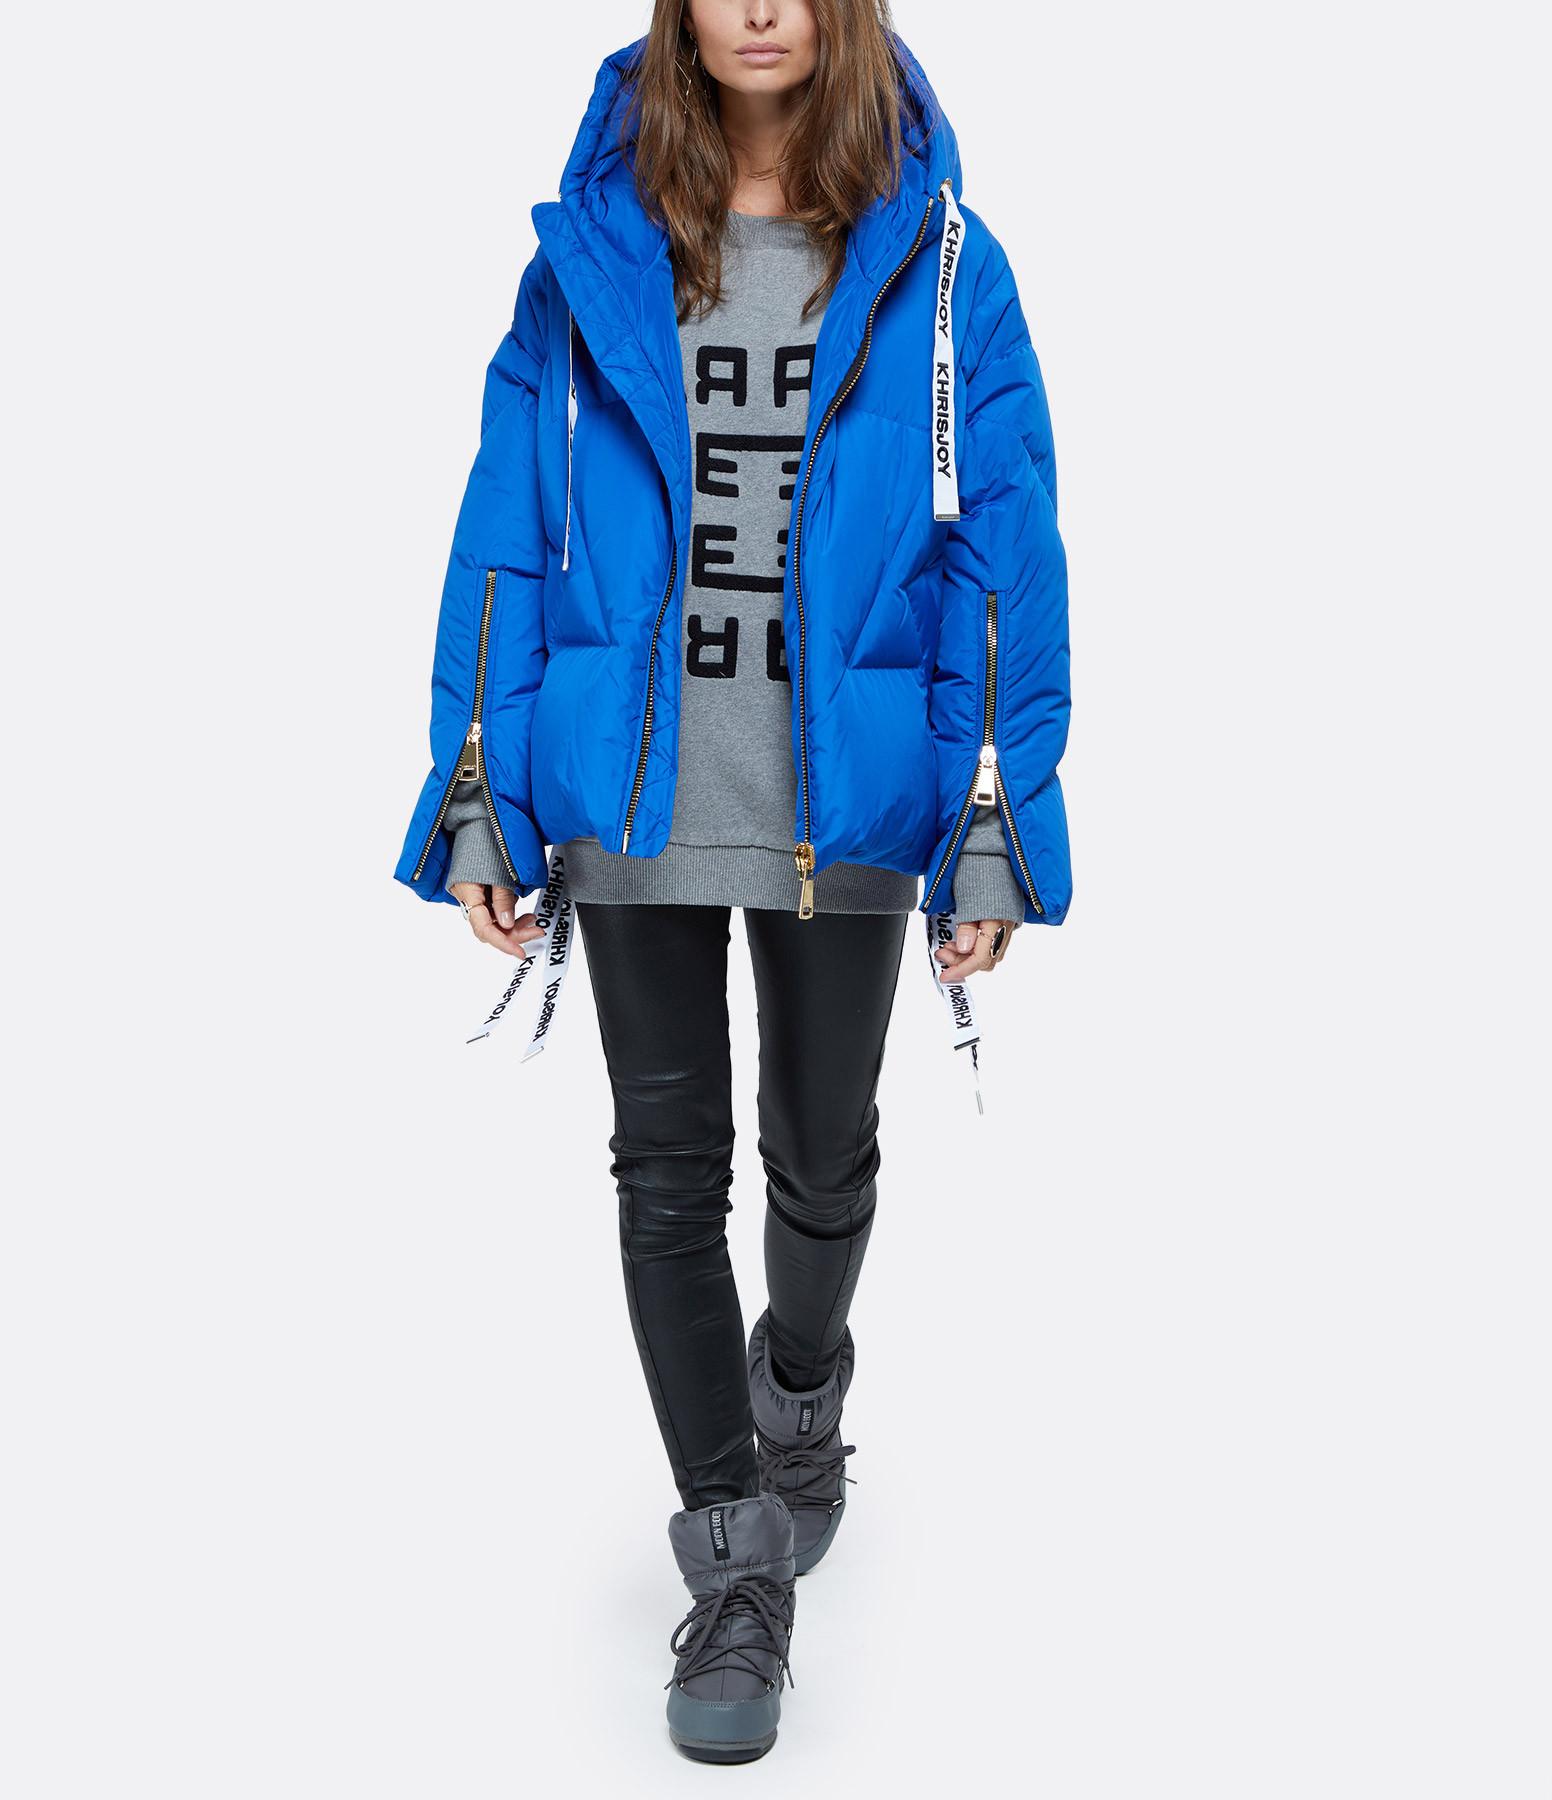 RAIINE - Sweatshirt Diaz Gris